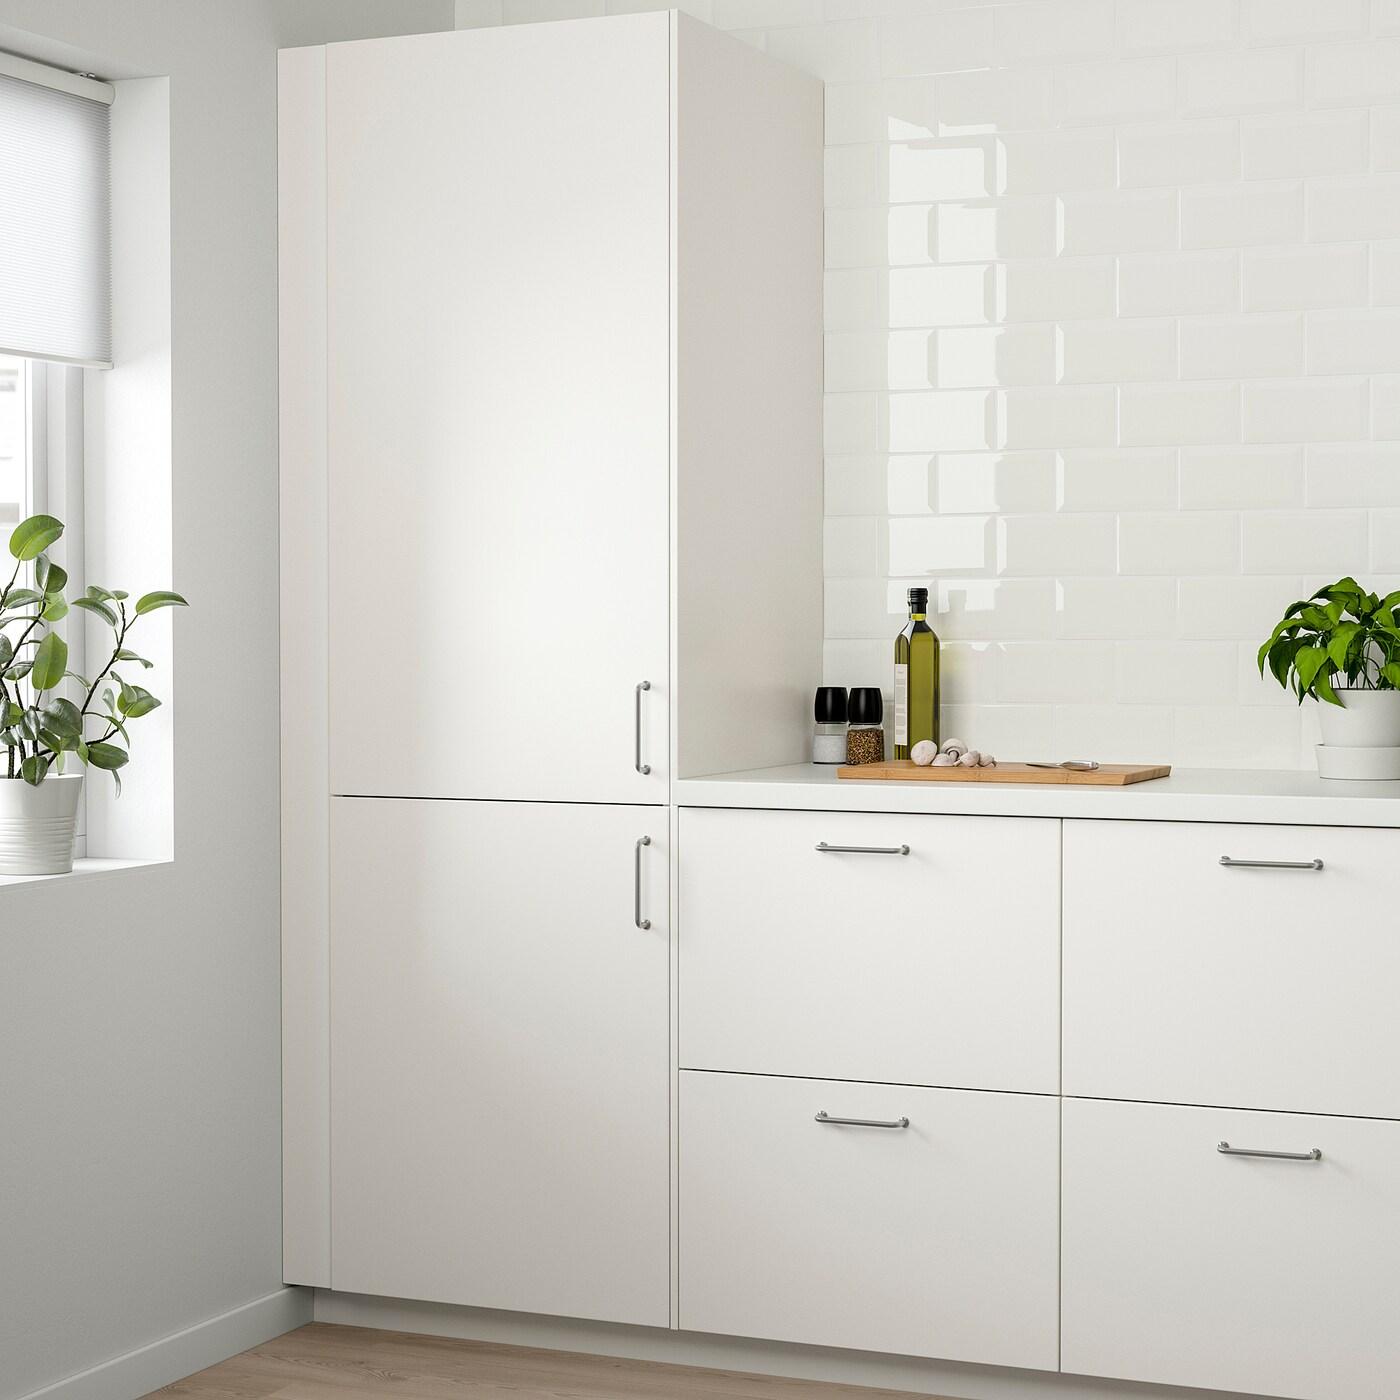 Veddinge Door White Ikea Switzerland